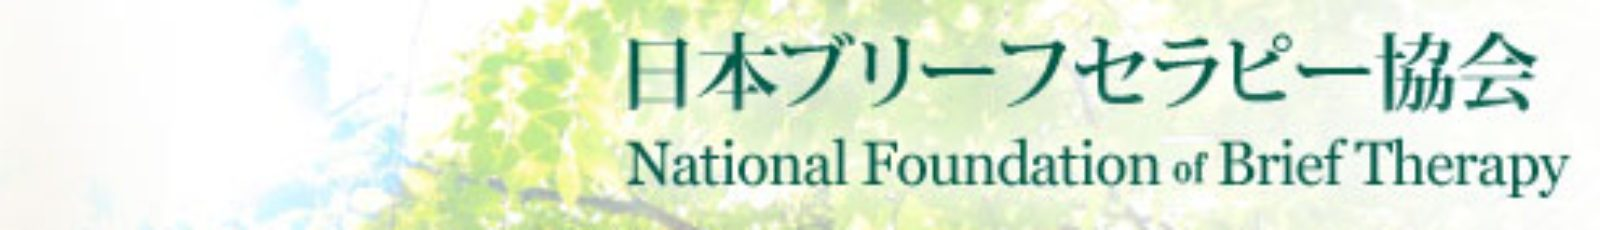 NFBTカウンセリングオフィス東京